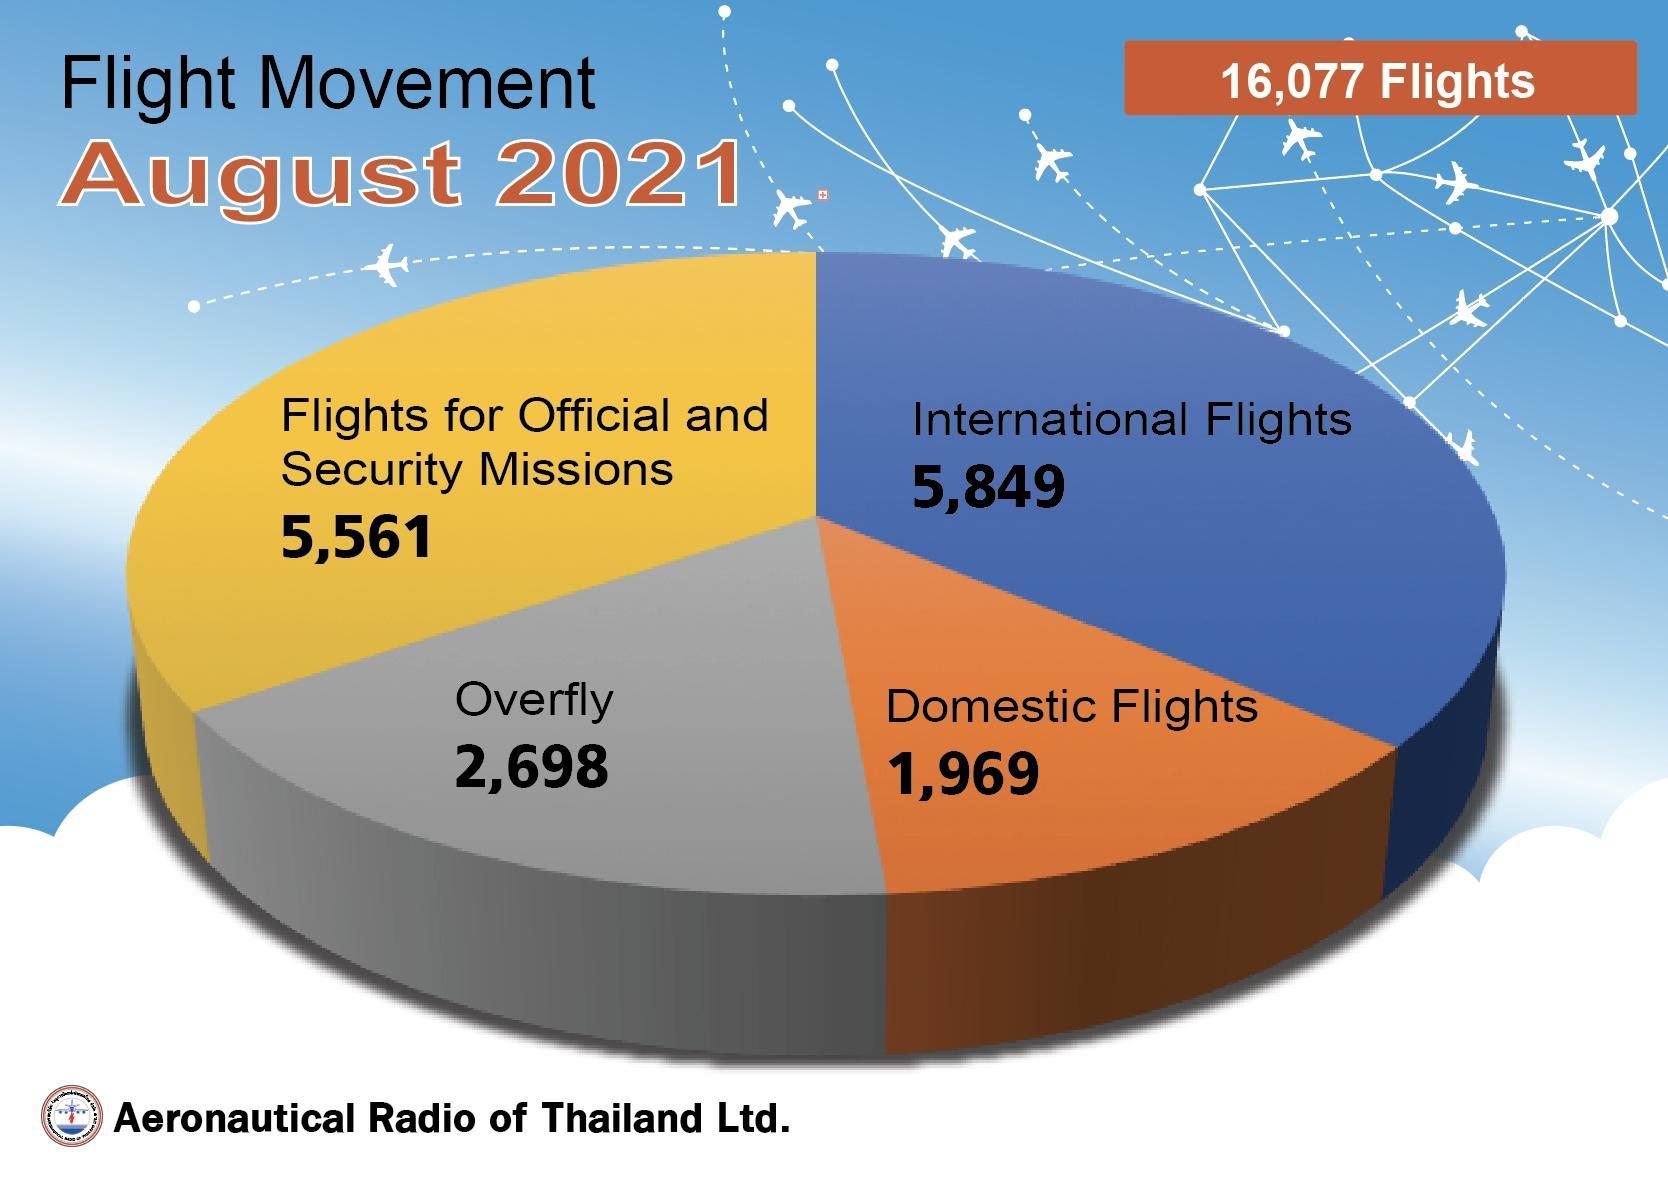 Flight Movement